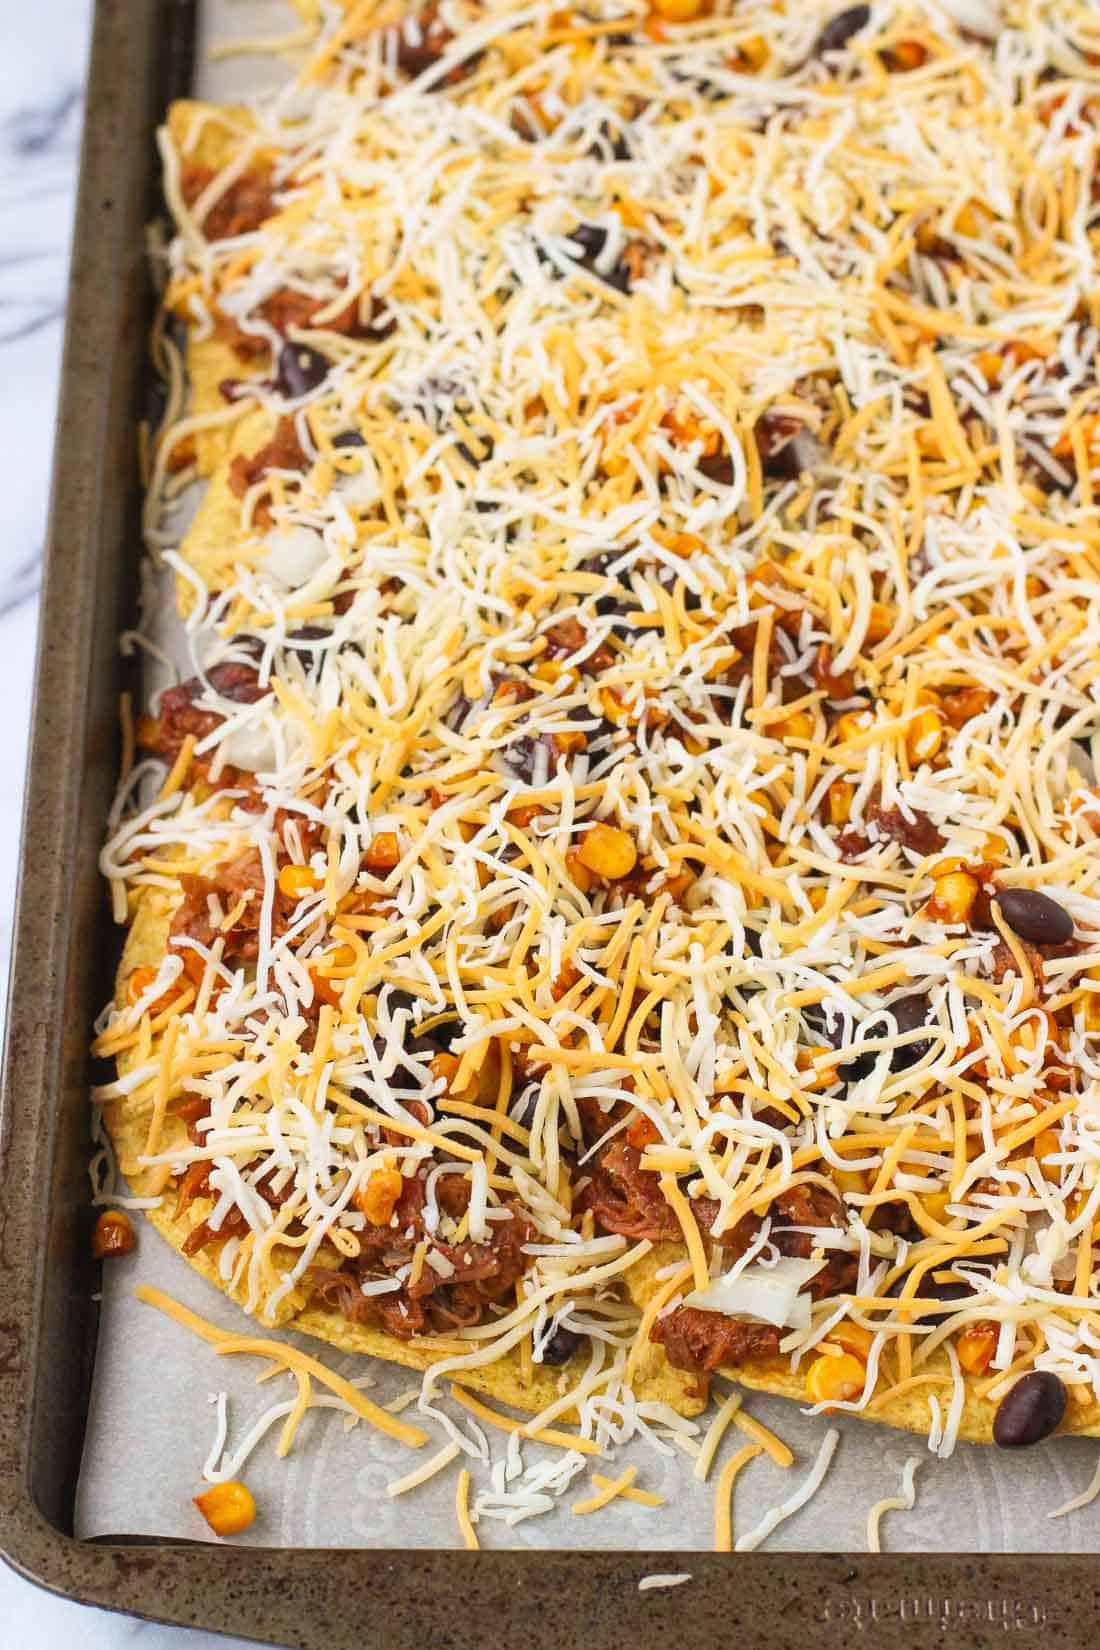 BBQ Pulled Pork Nachos | mysequinedlife.com